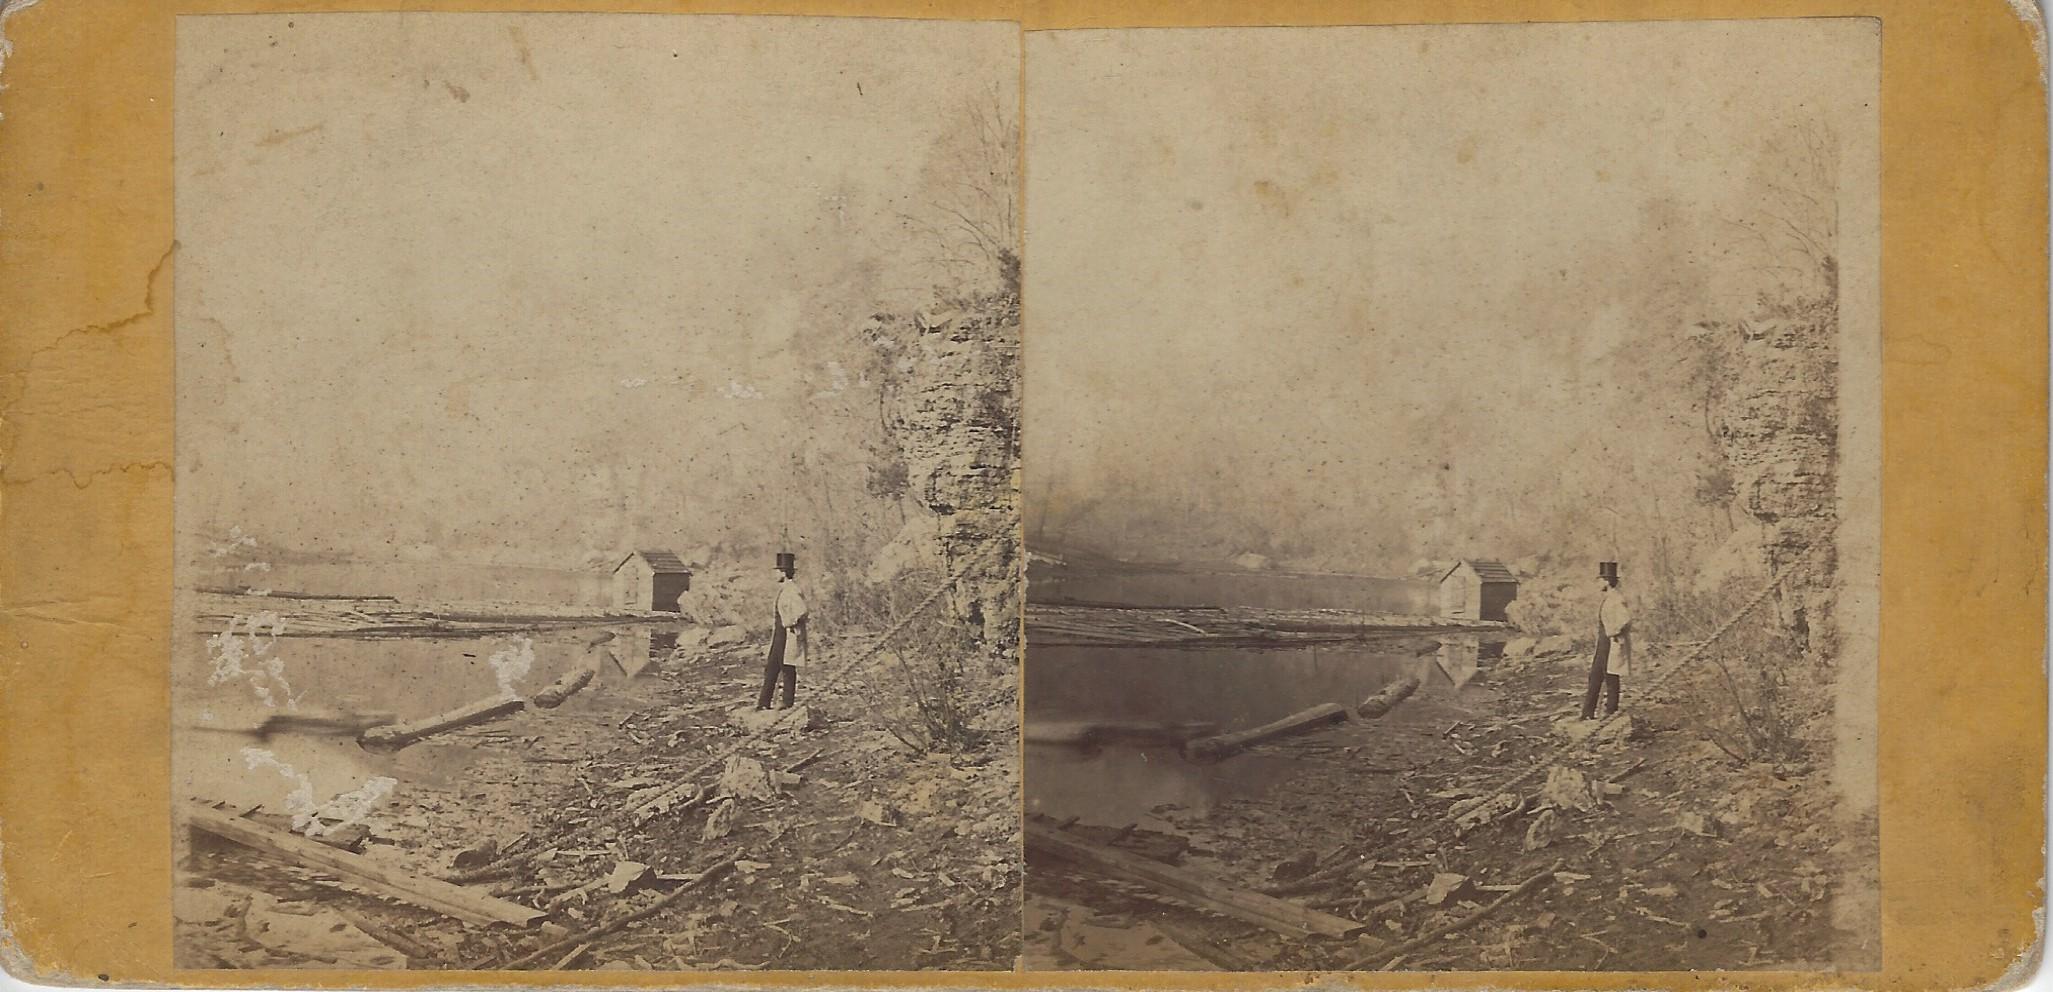 LJTP 100.270 - S. Root SAD - Gentleman surveying Catfish Creek - c1875